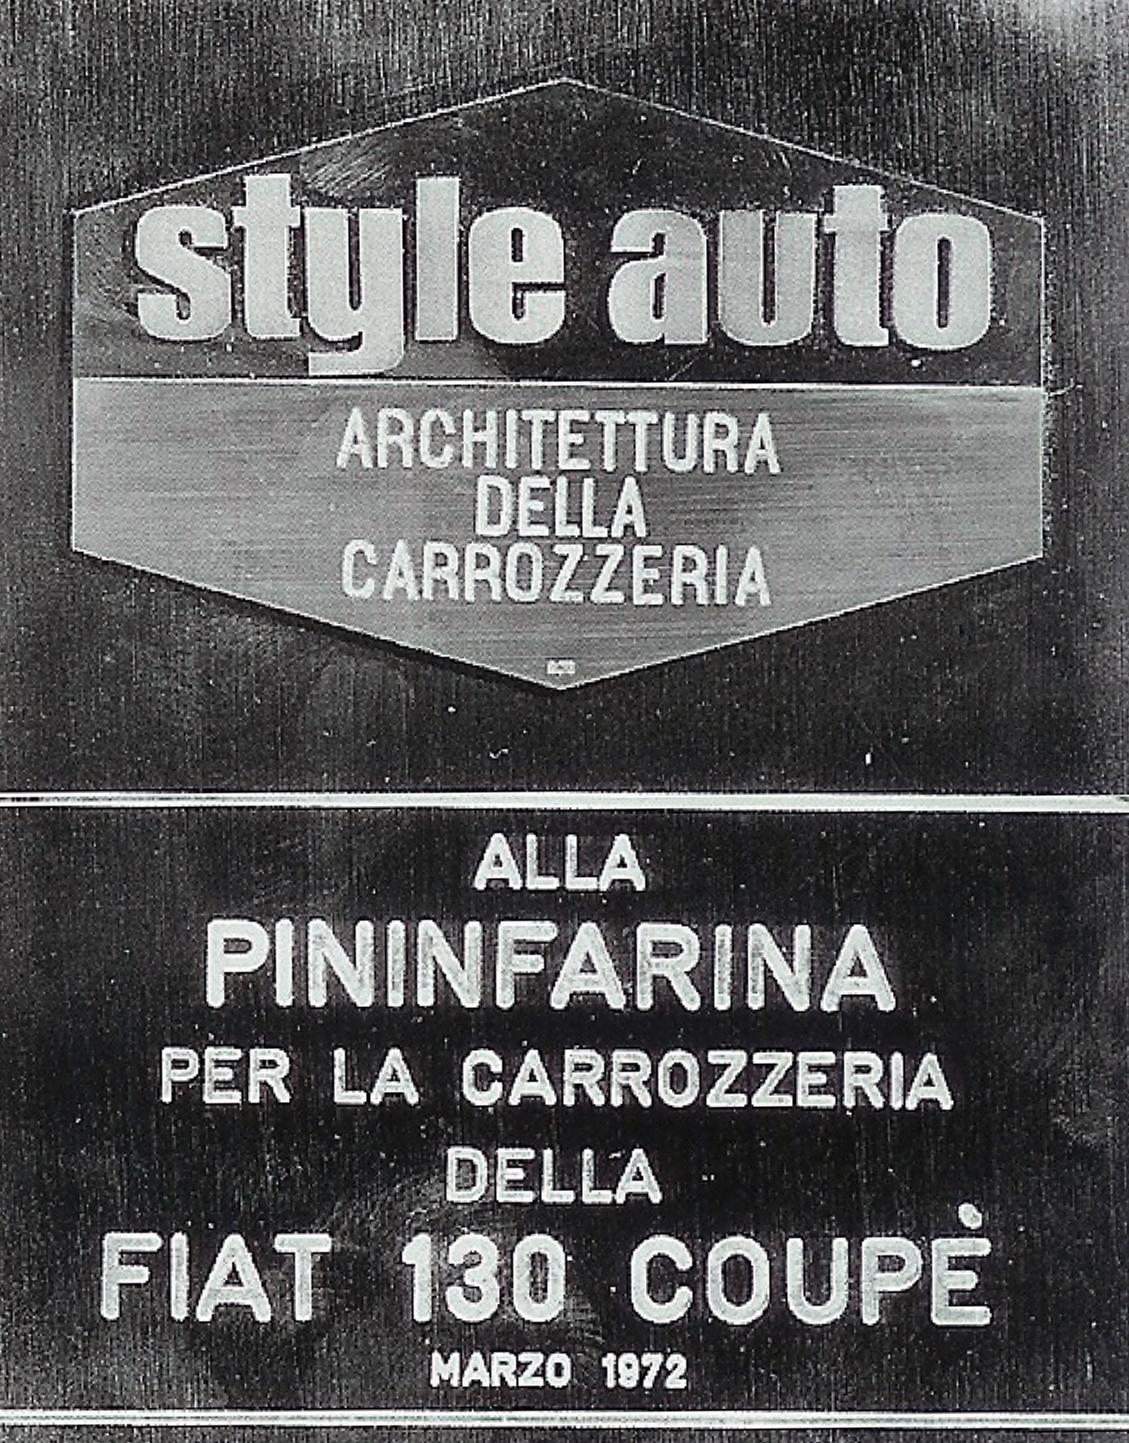 Onderscheiding Fiat 130 Coupe